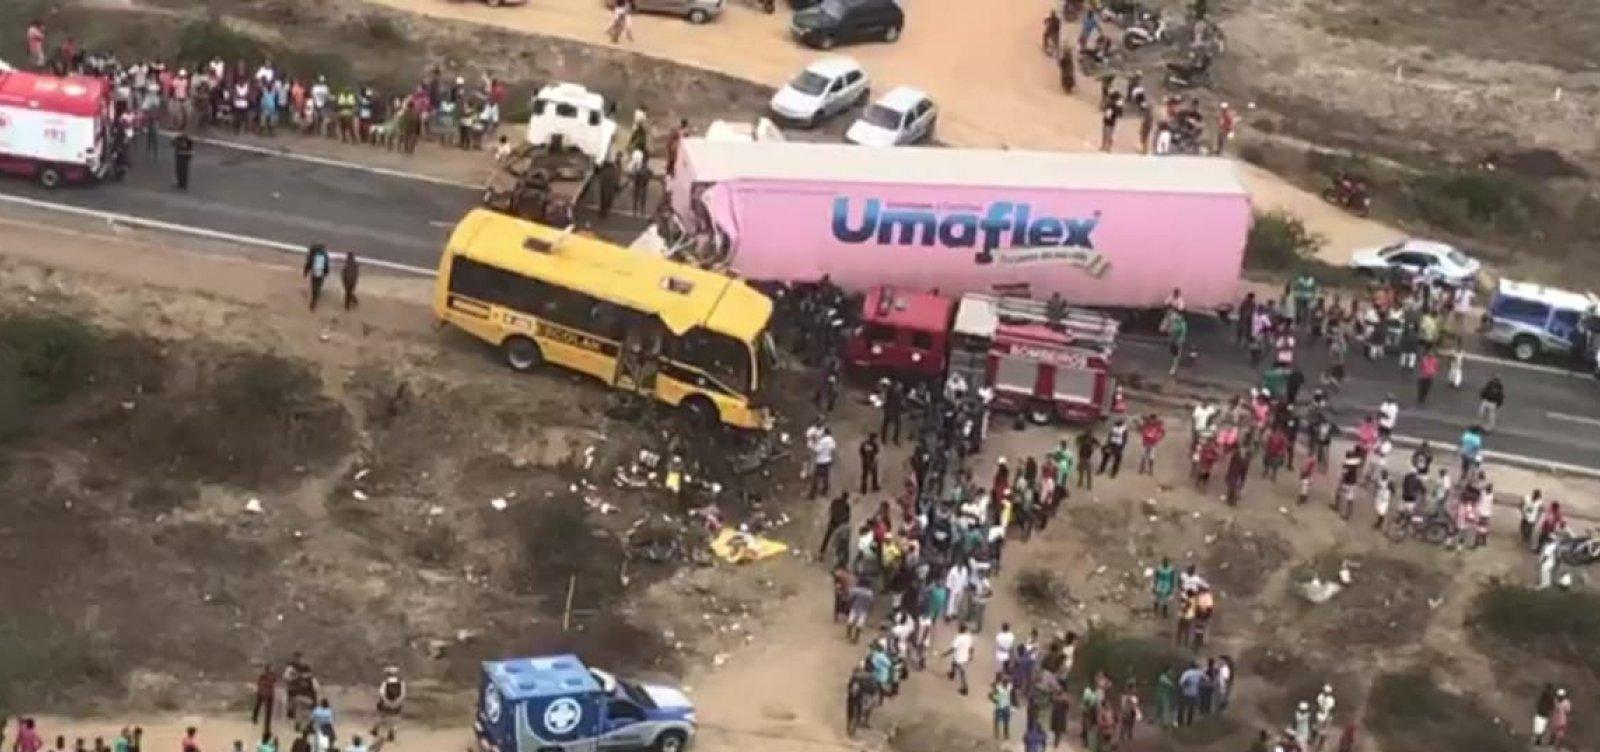 [Polícia identifica vítimas de acidente na BR-116]